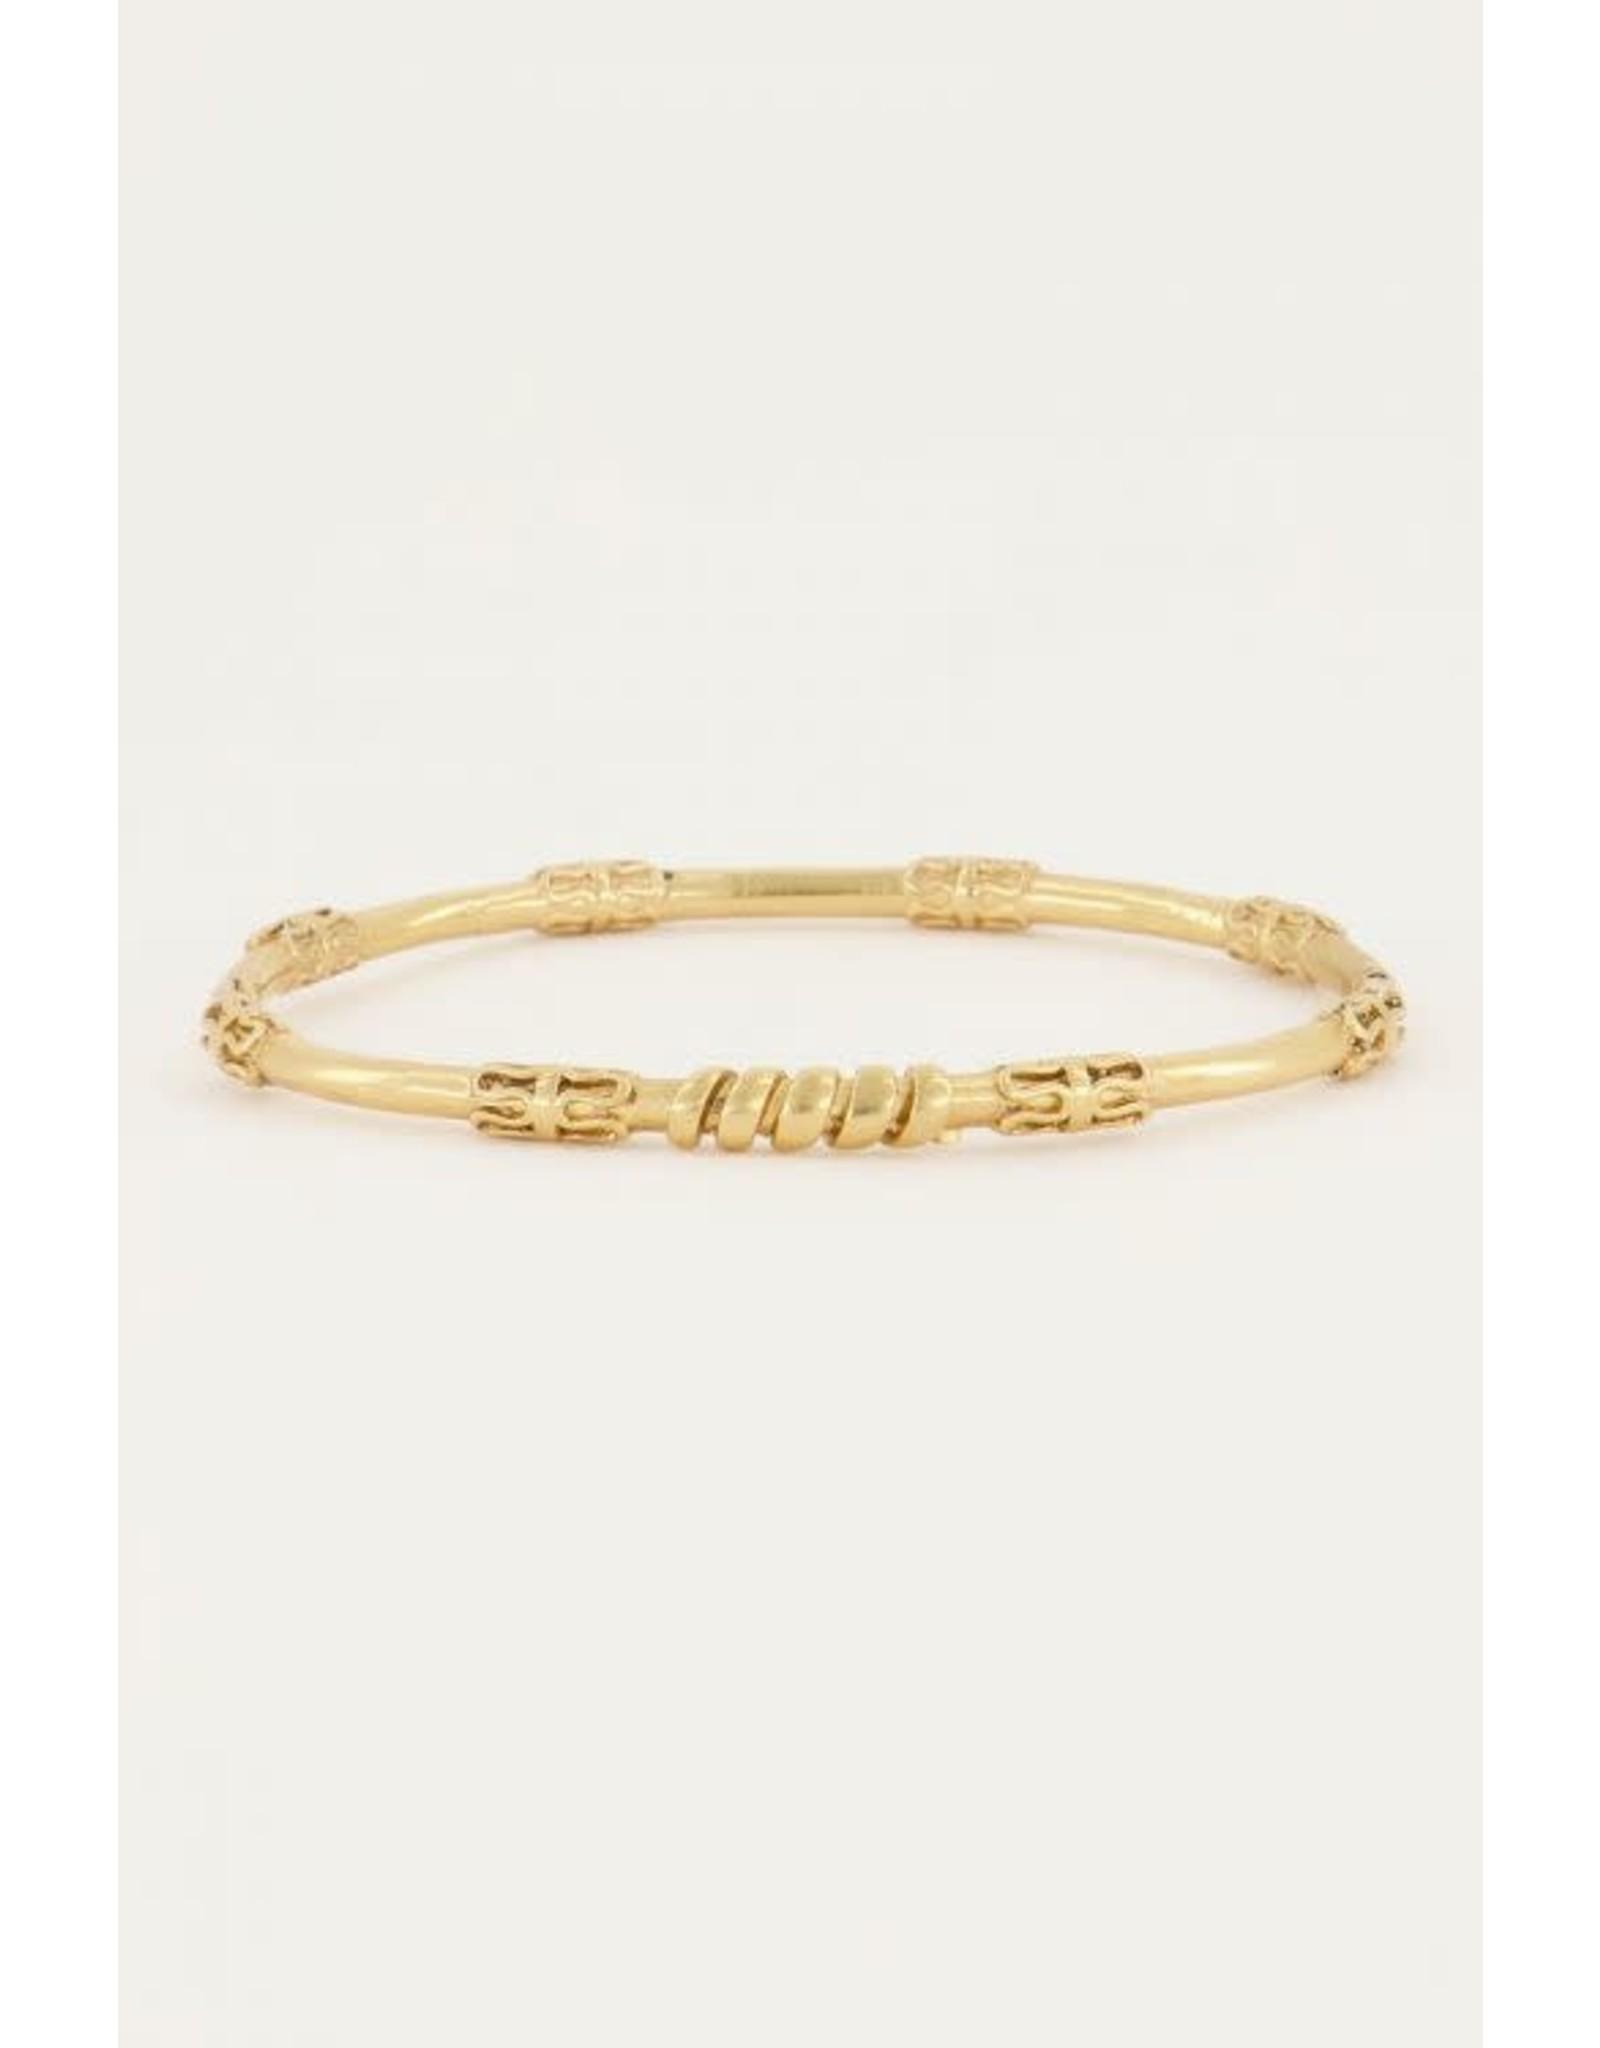 My Jewellery My Jewellery bangle patroon gedraaid